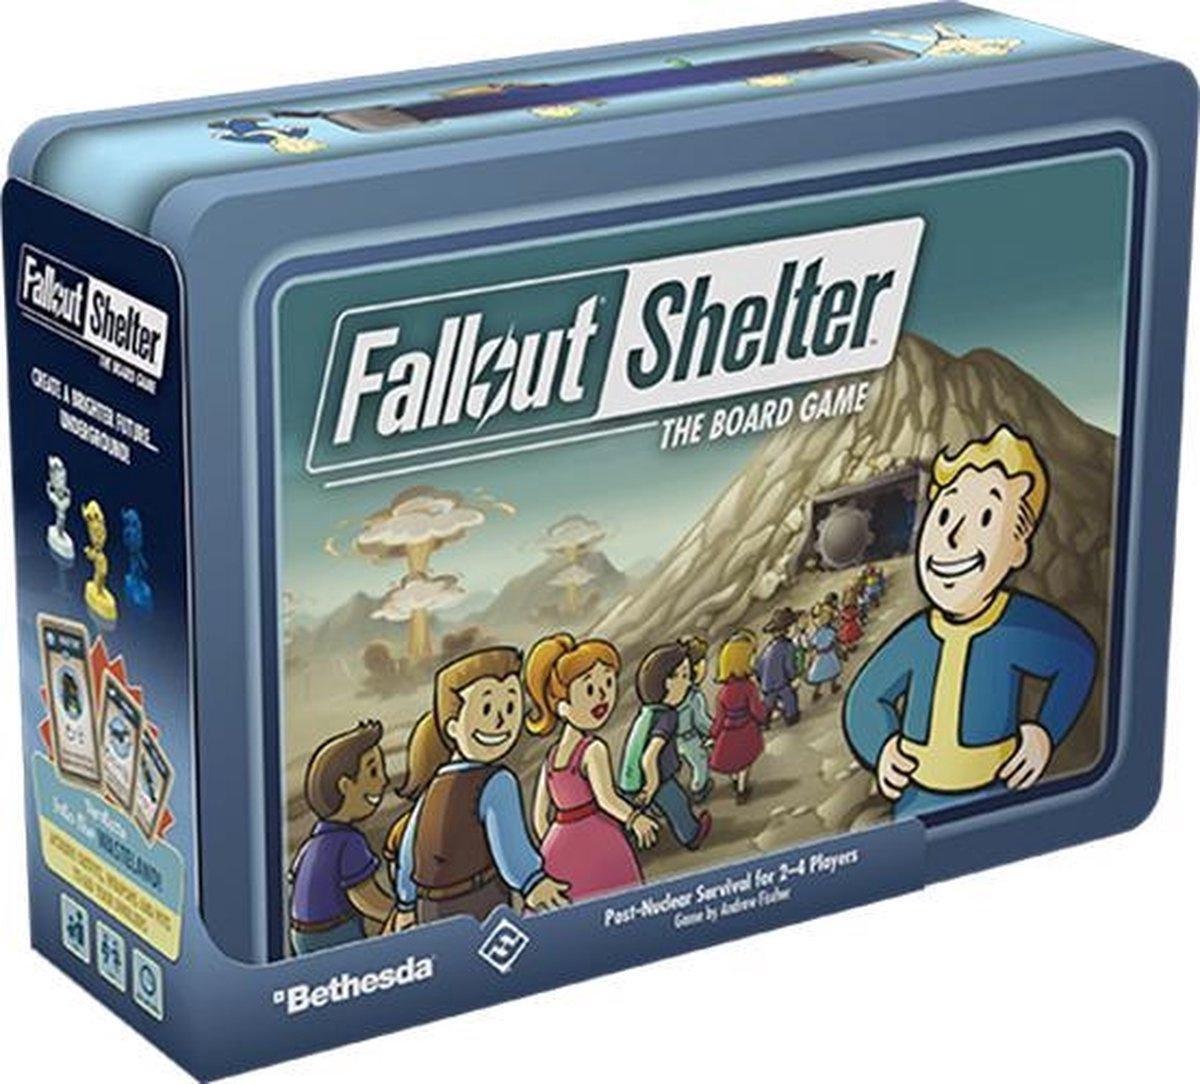 Fallout Shelter The Board Game - Engelstalig Bordspel